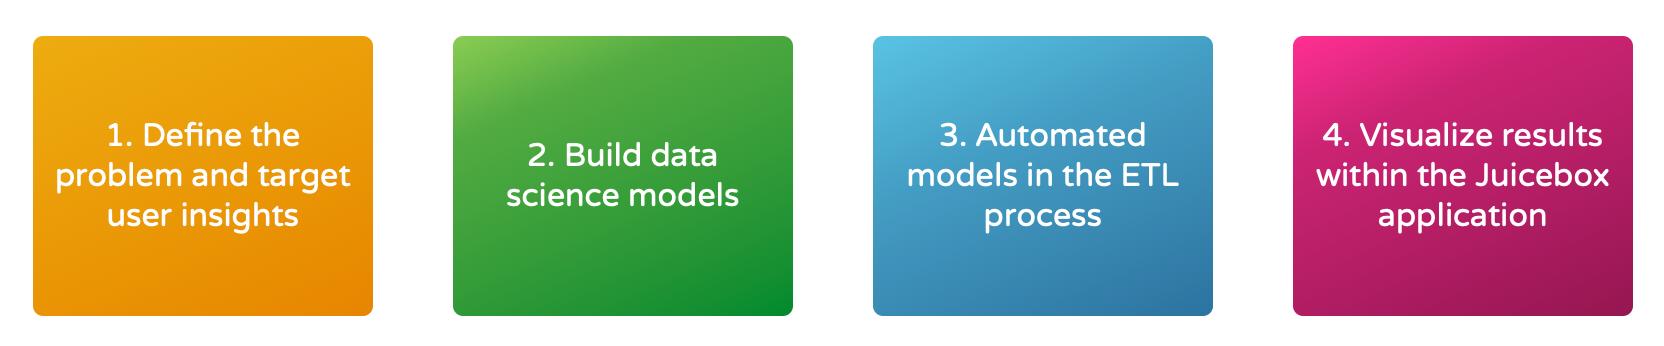 advanced_analytics_process.png